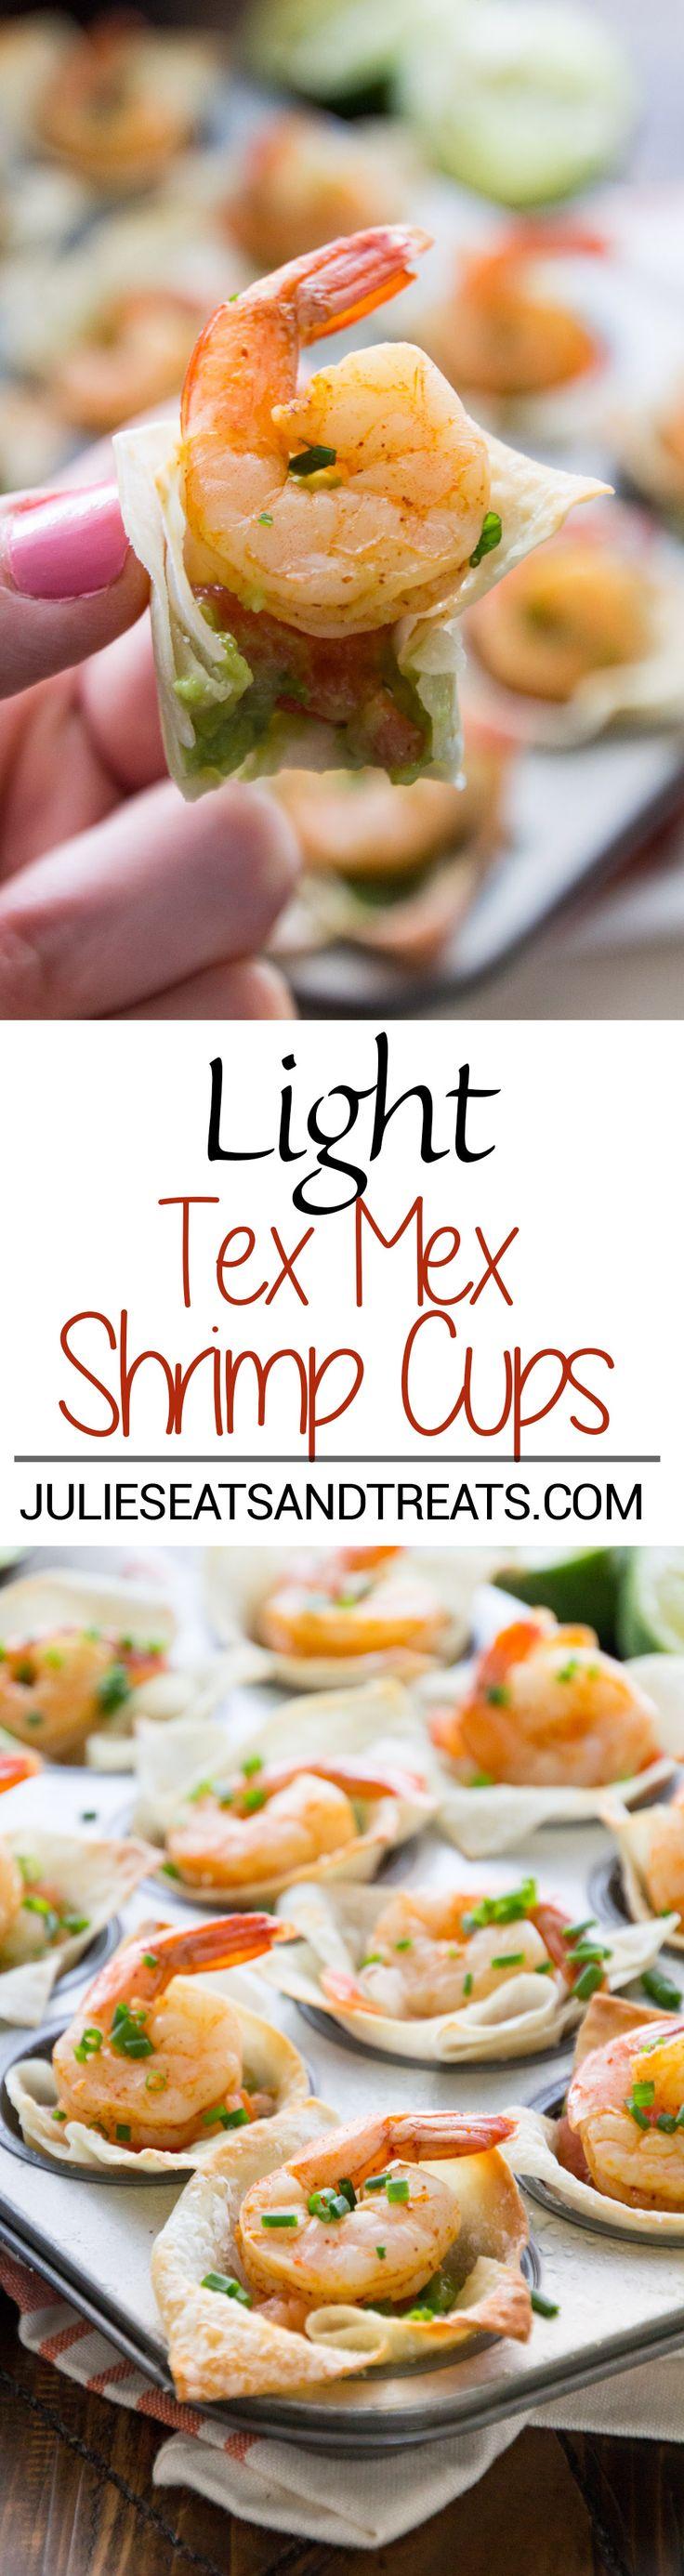 Light Tex Mex Shrimp Bites Recipe ~ Perfect Holiday Appetizer! Crunchy Wonton Shells Stuffed with Pico de Gallo, Guacamole, and Seasoned Shrimp! Plus, it's a Light Appetizer So You Won't Feel Guilty! @eatshrimp #ad